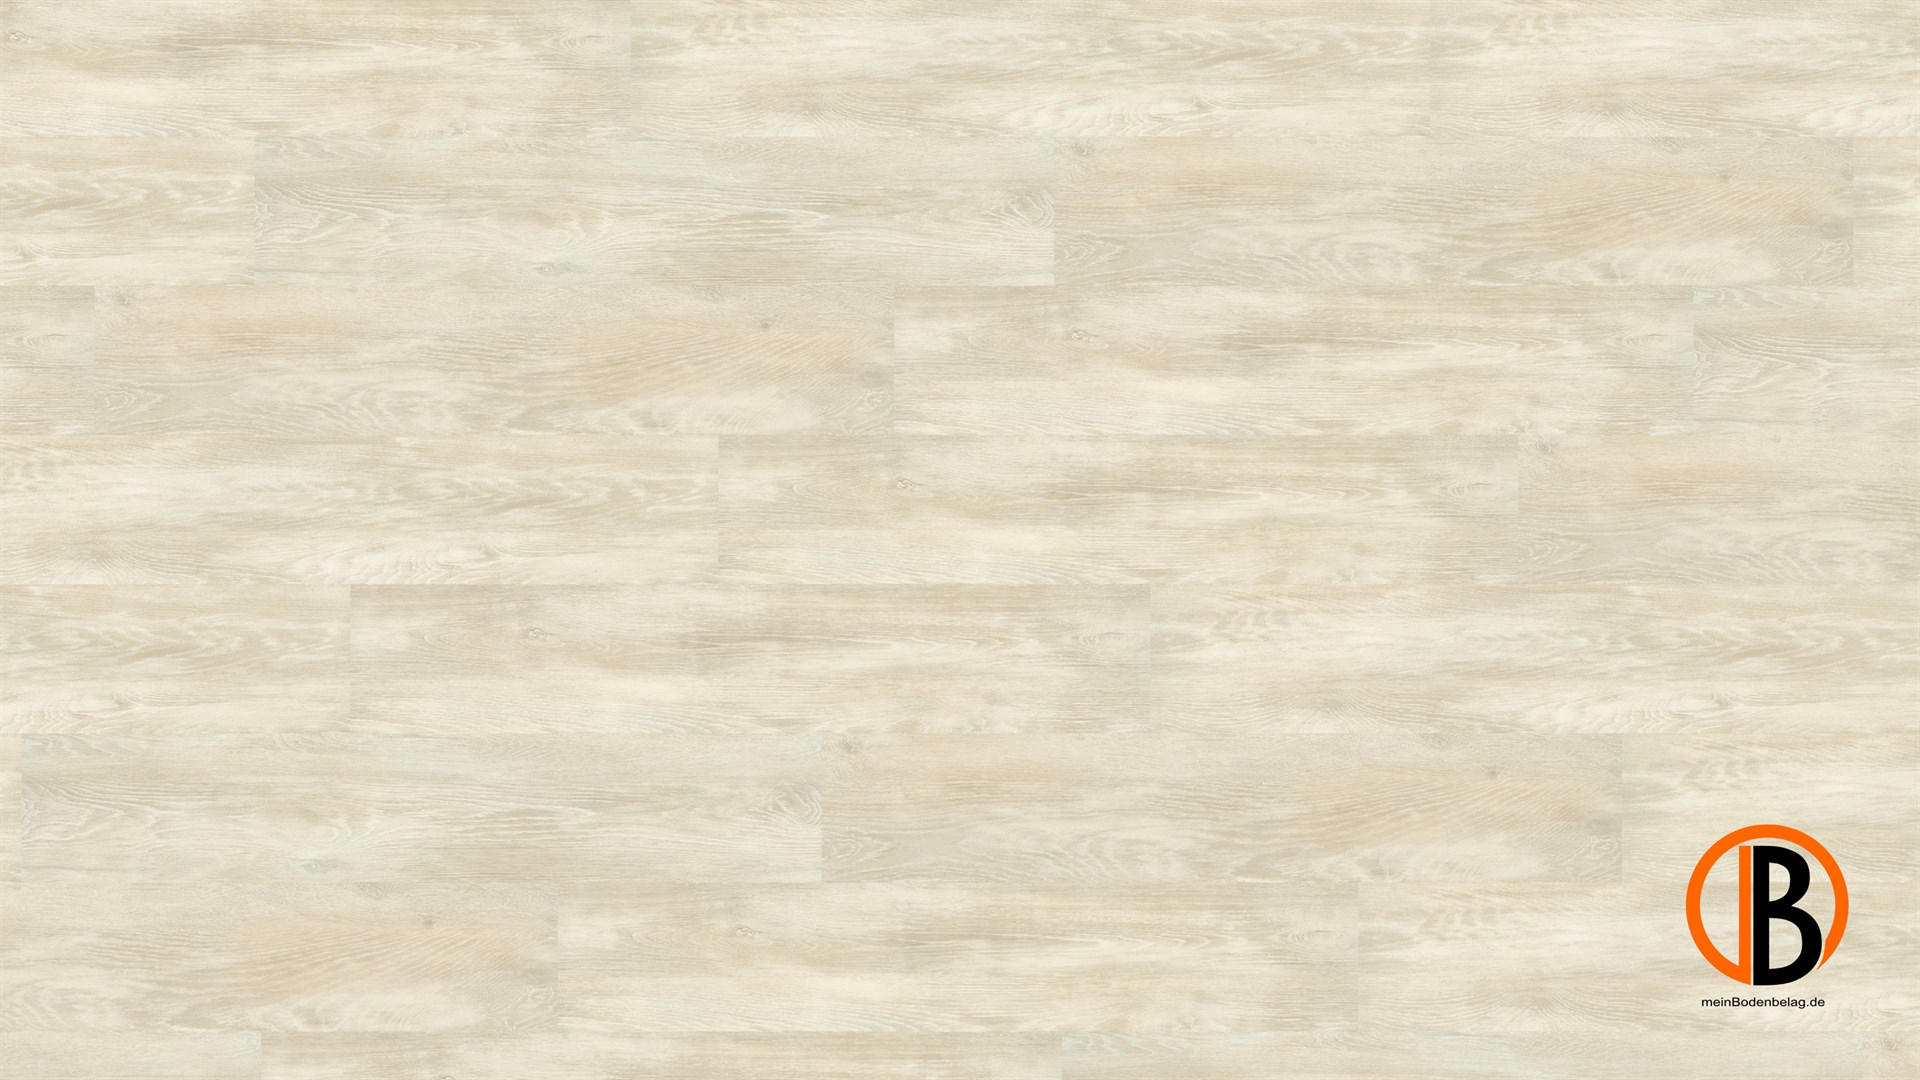 CINQUE KWG DESIGNBODEN ANTIGUA GREEN, PVC-FREI | 10000293;0 | Bild 1